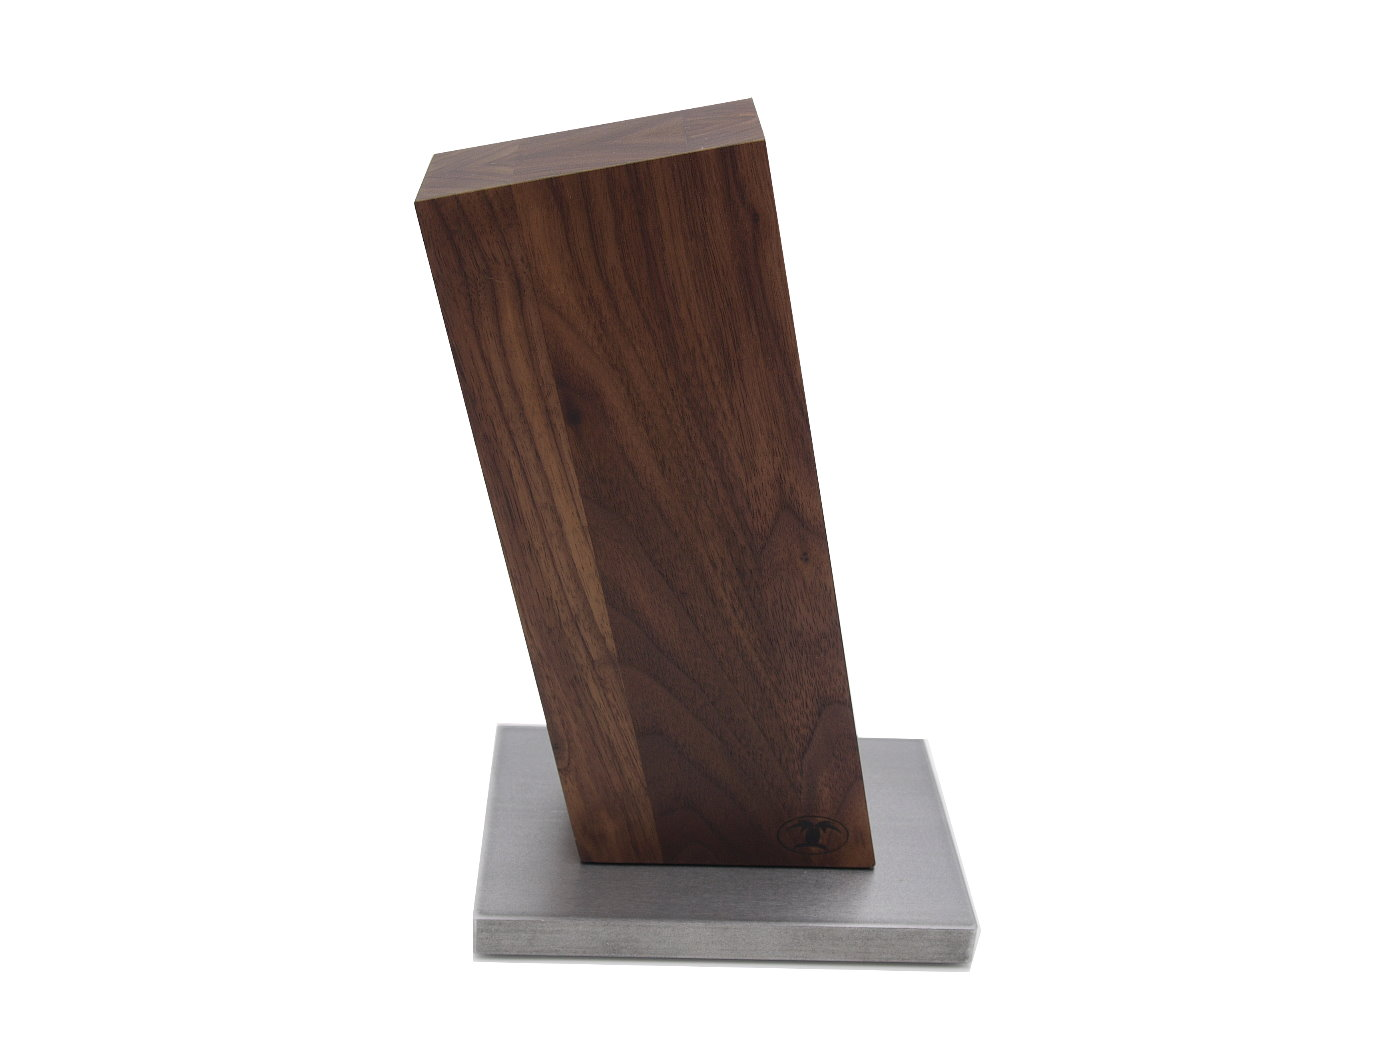 blockwerk messerblock magnetisch 13 grad nussbaum mit stahlsockel messerkontor. Black Bedroom Furniture Sets. Home Design Ideas